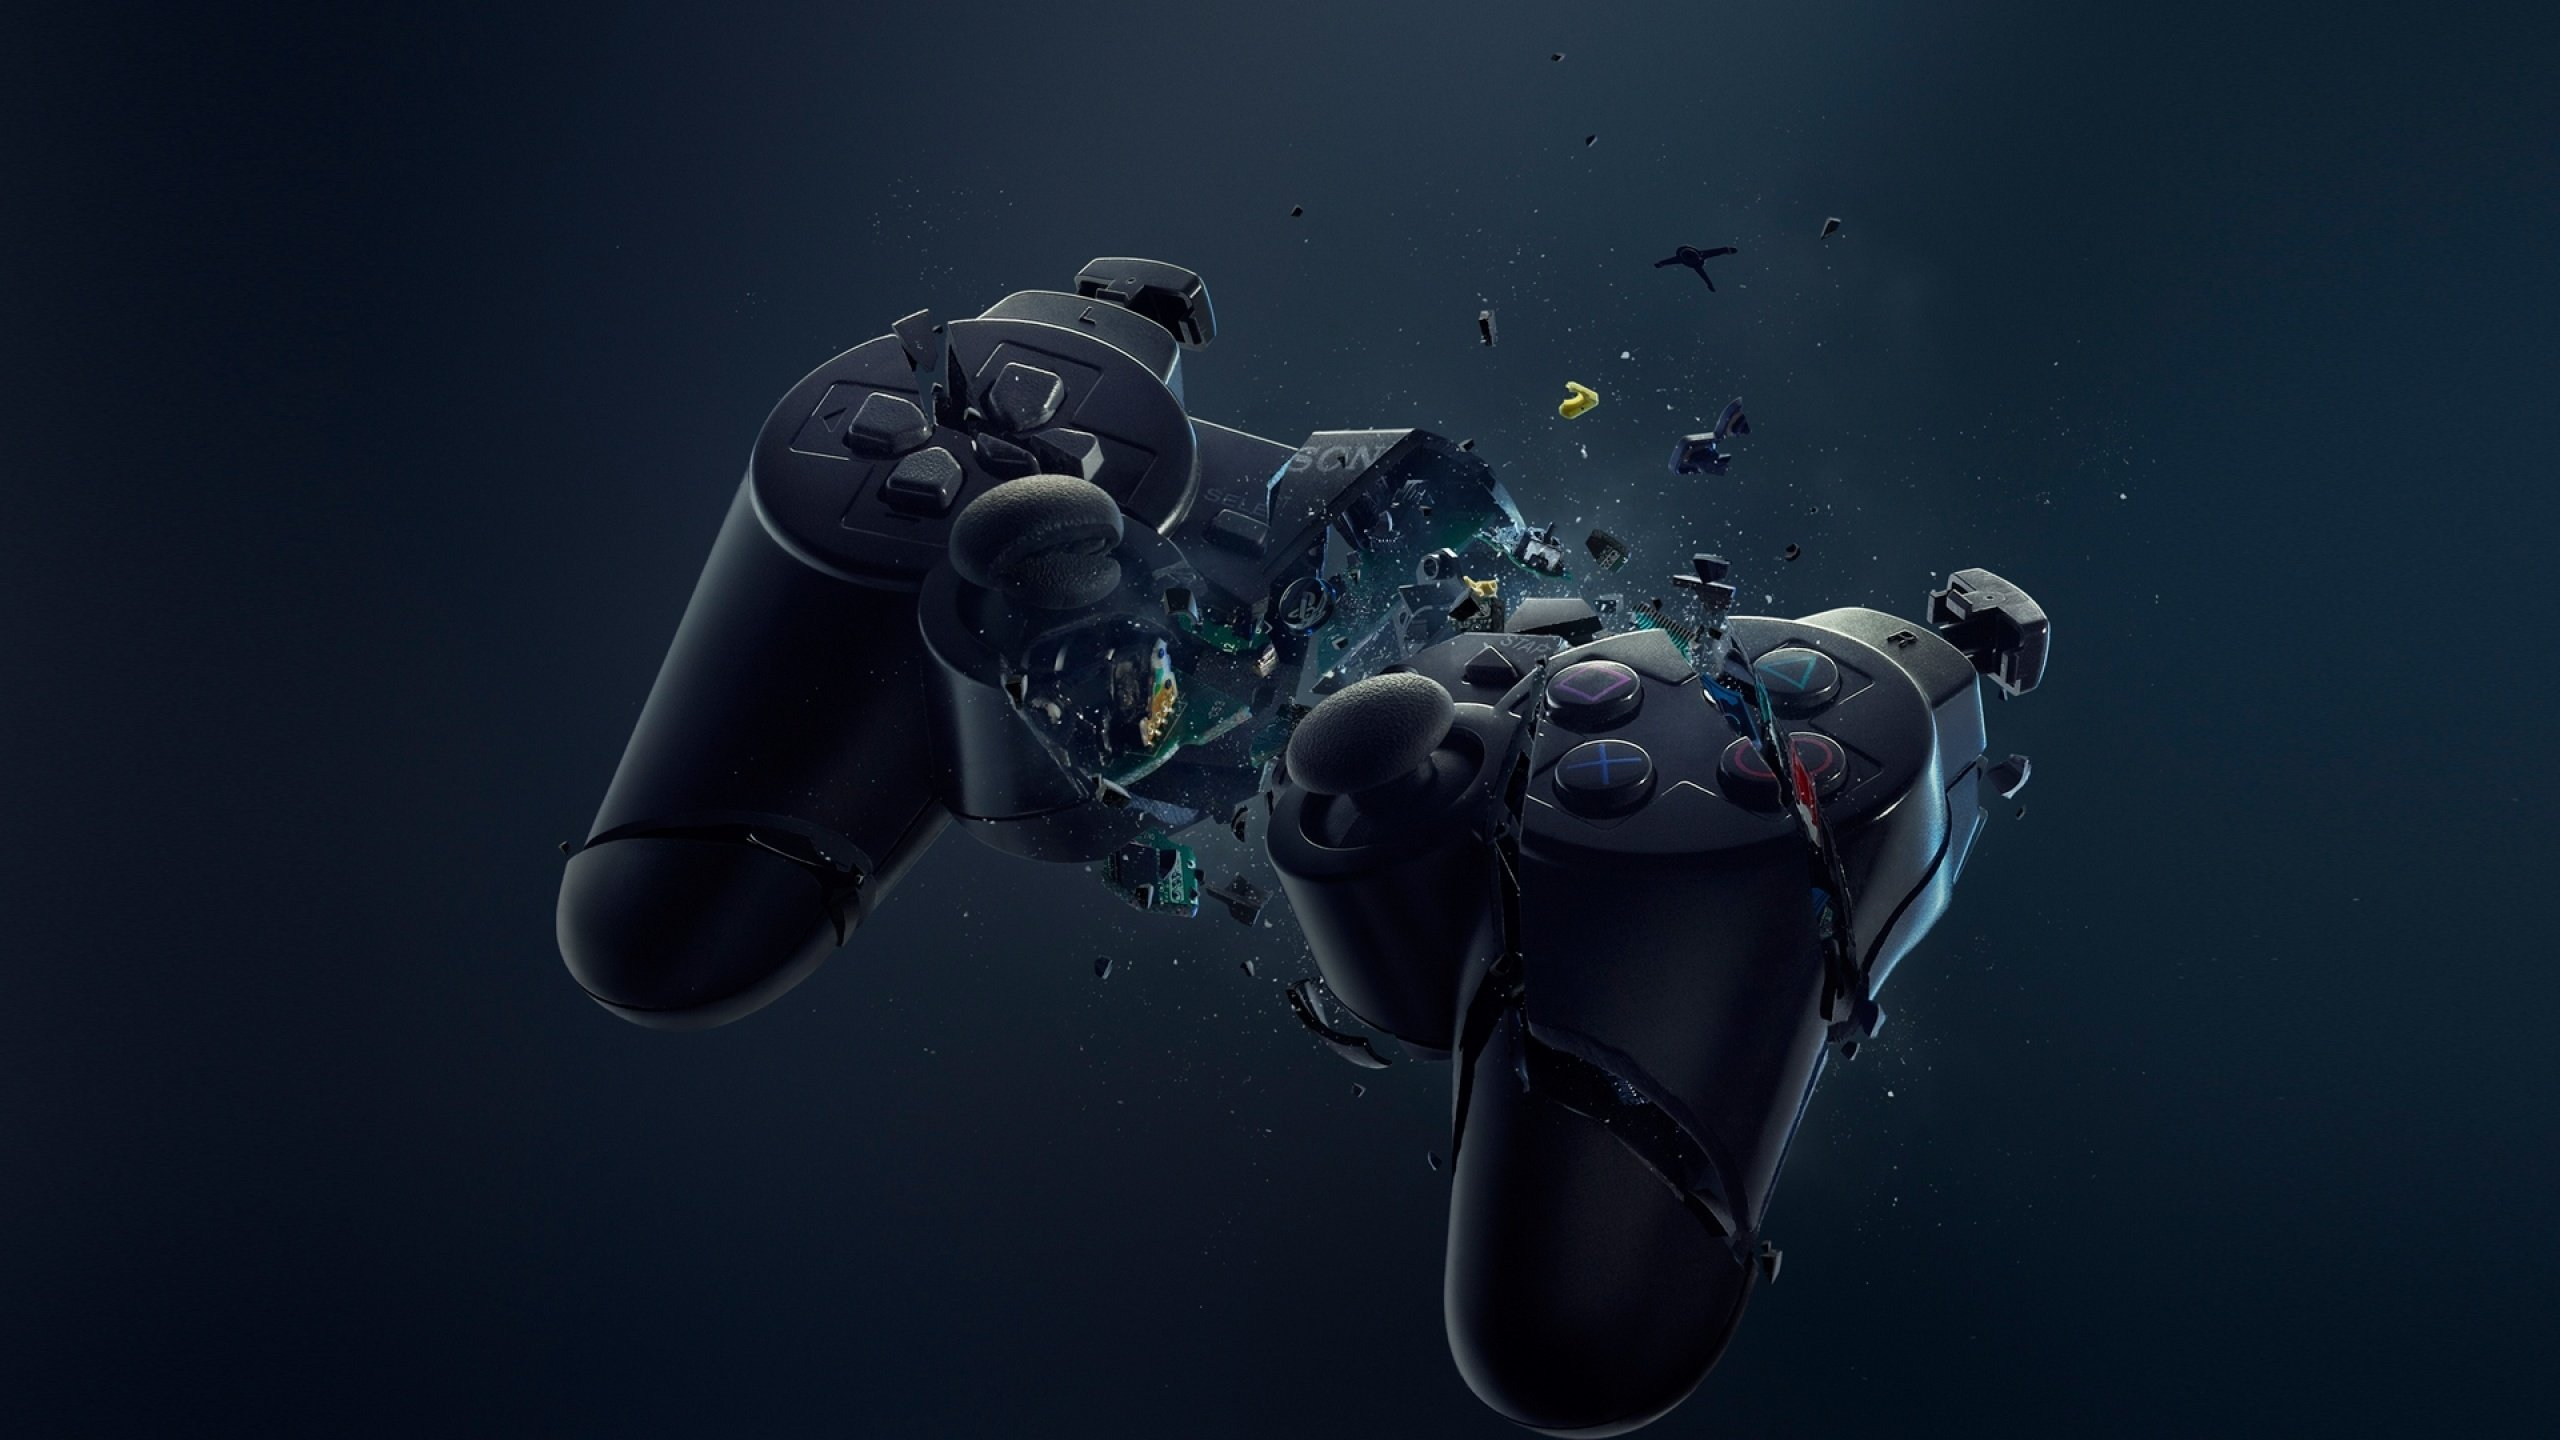 Download Broken Playstation 3 Controller Wallpaper for 2560 x 1440 2560x1440